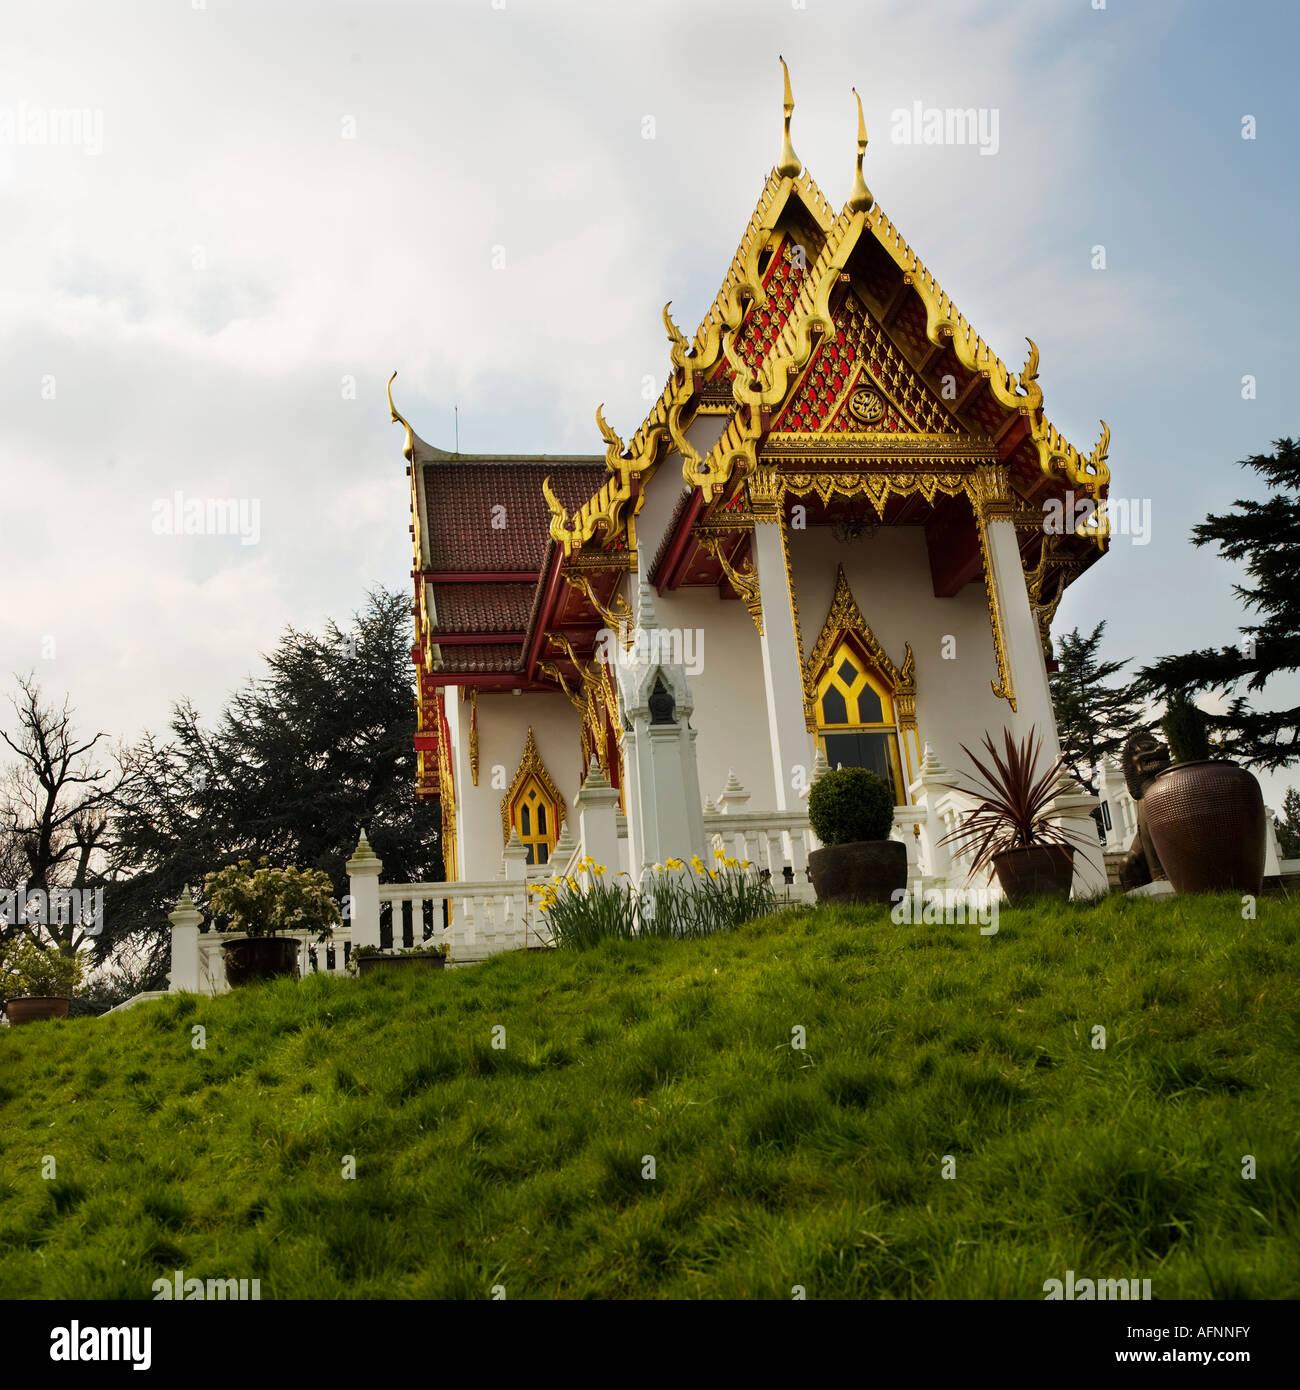 wat buddhapadipa thai buddhist temple in wimbledon london